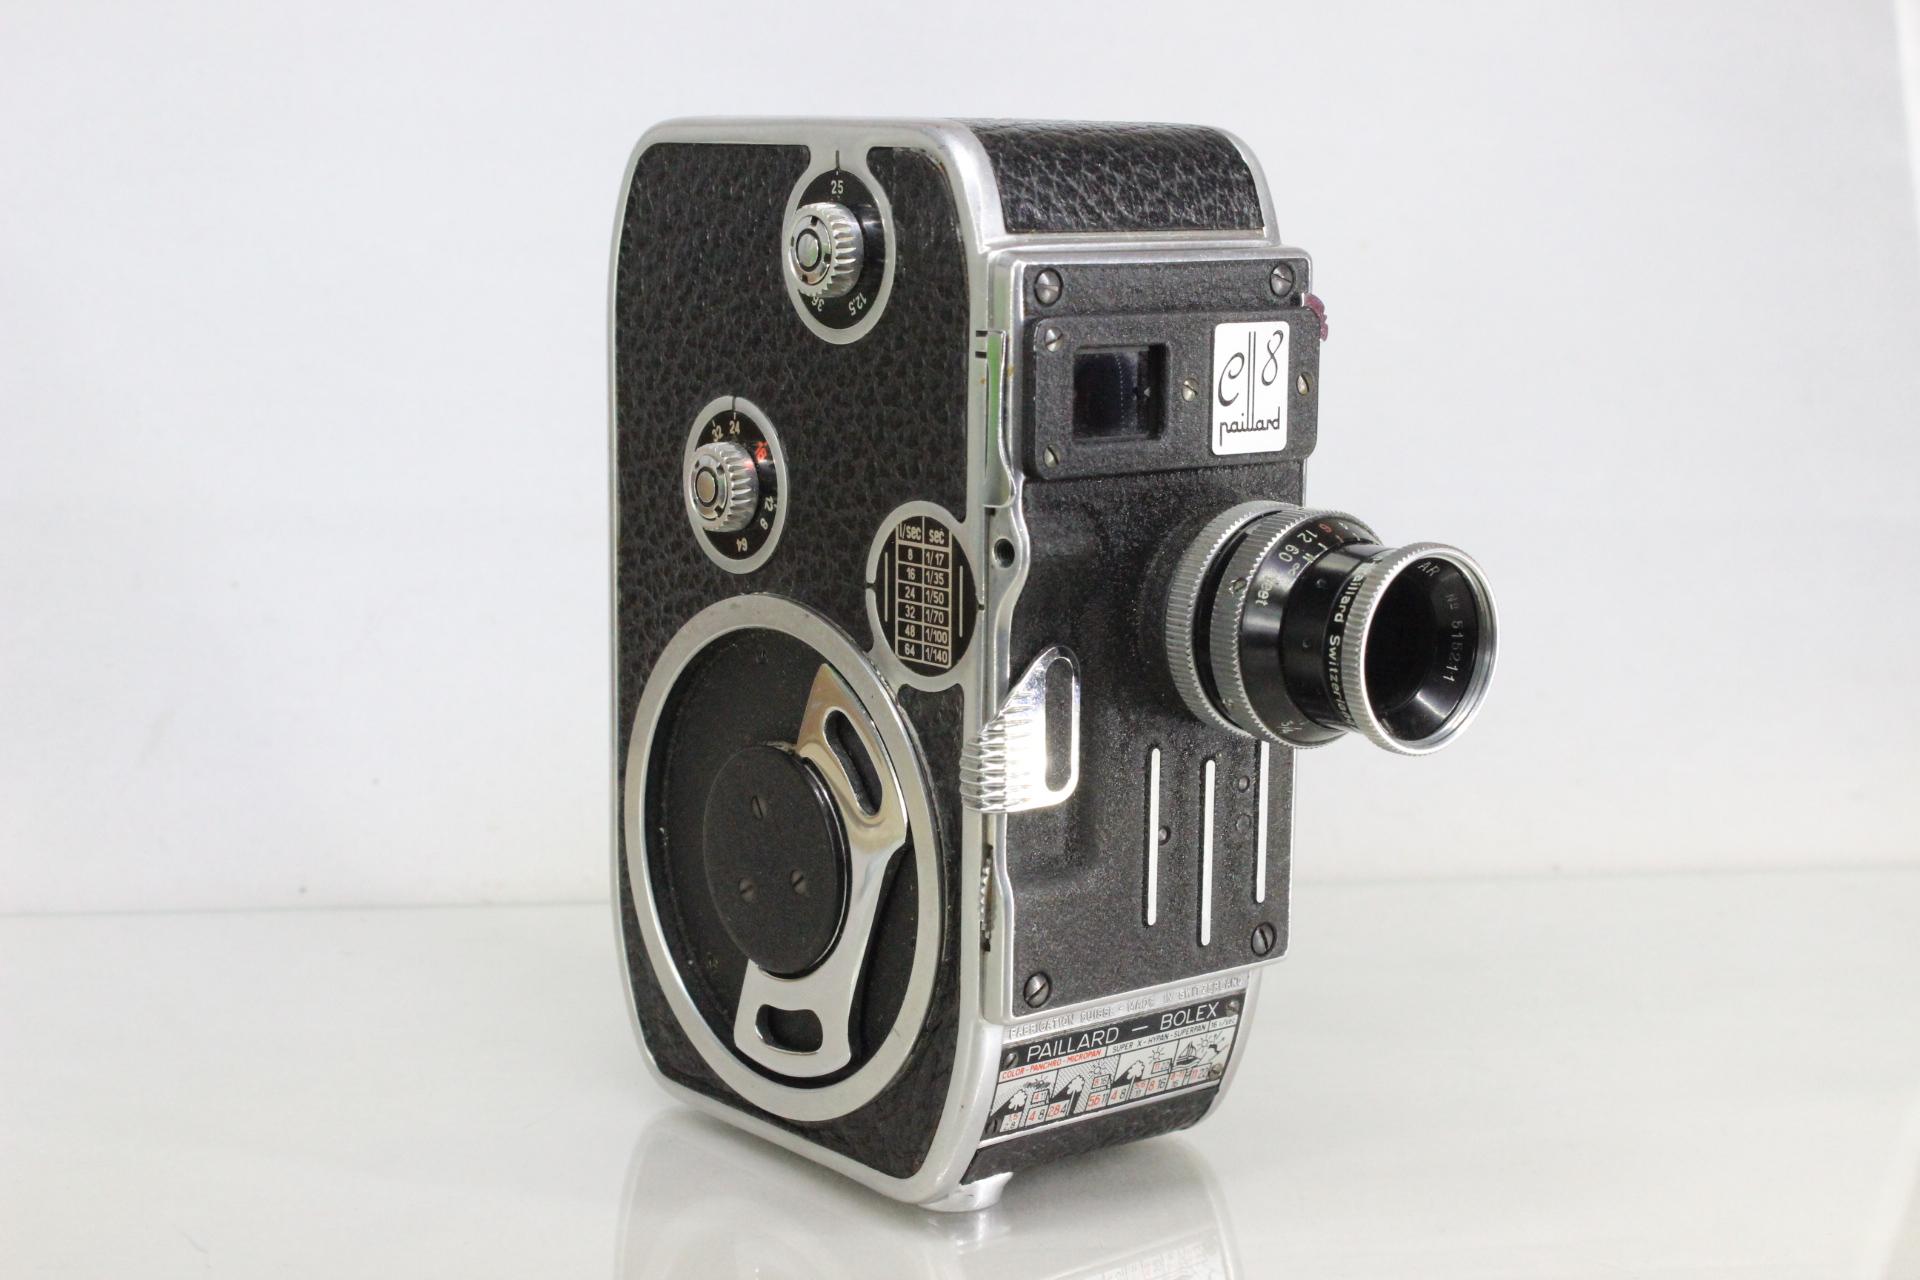 8Mm Vintage Camera paillard bolex c8 vintage 8mm cine movie film camera with